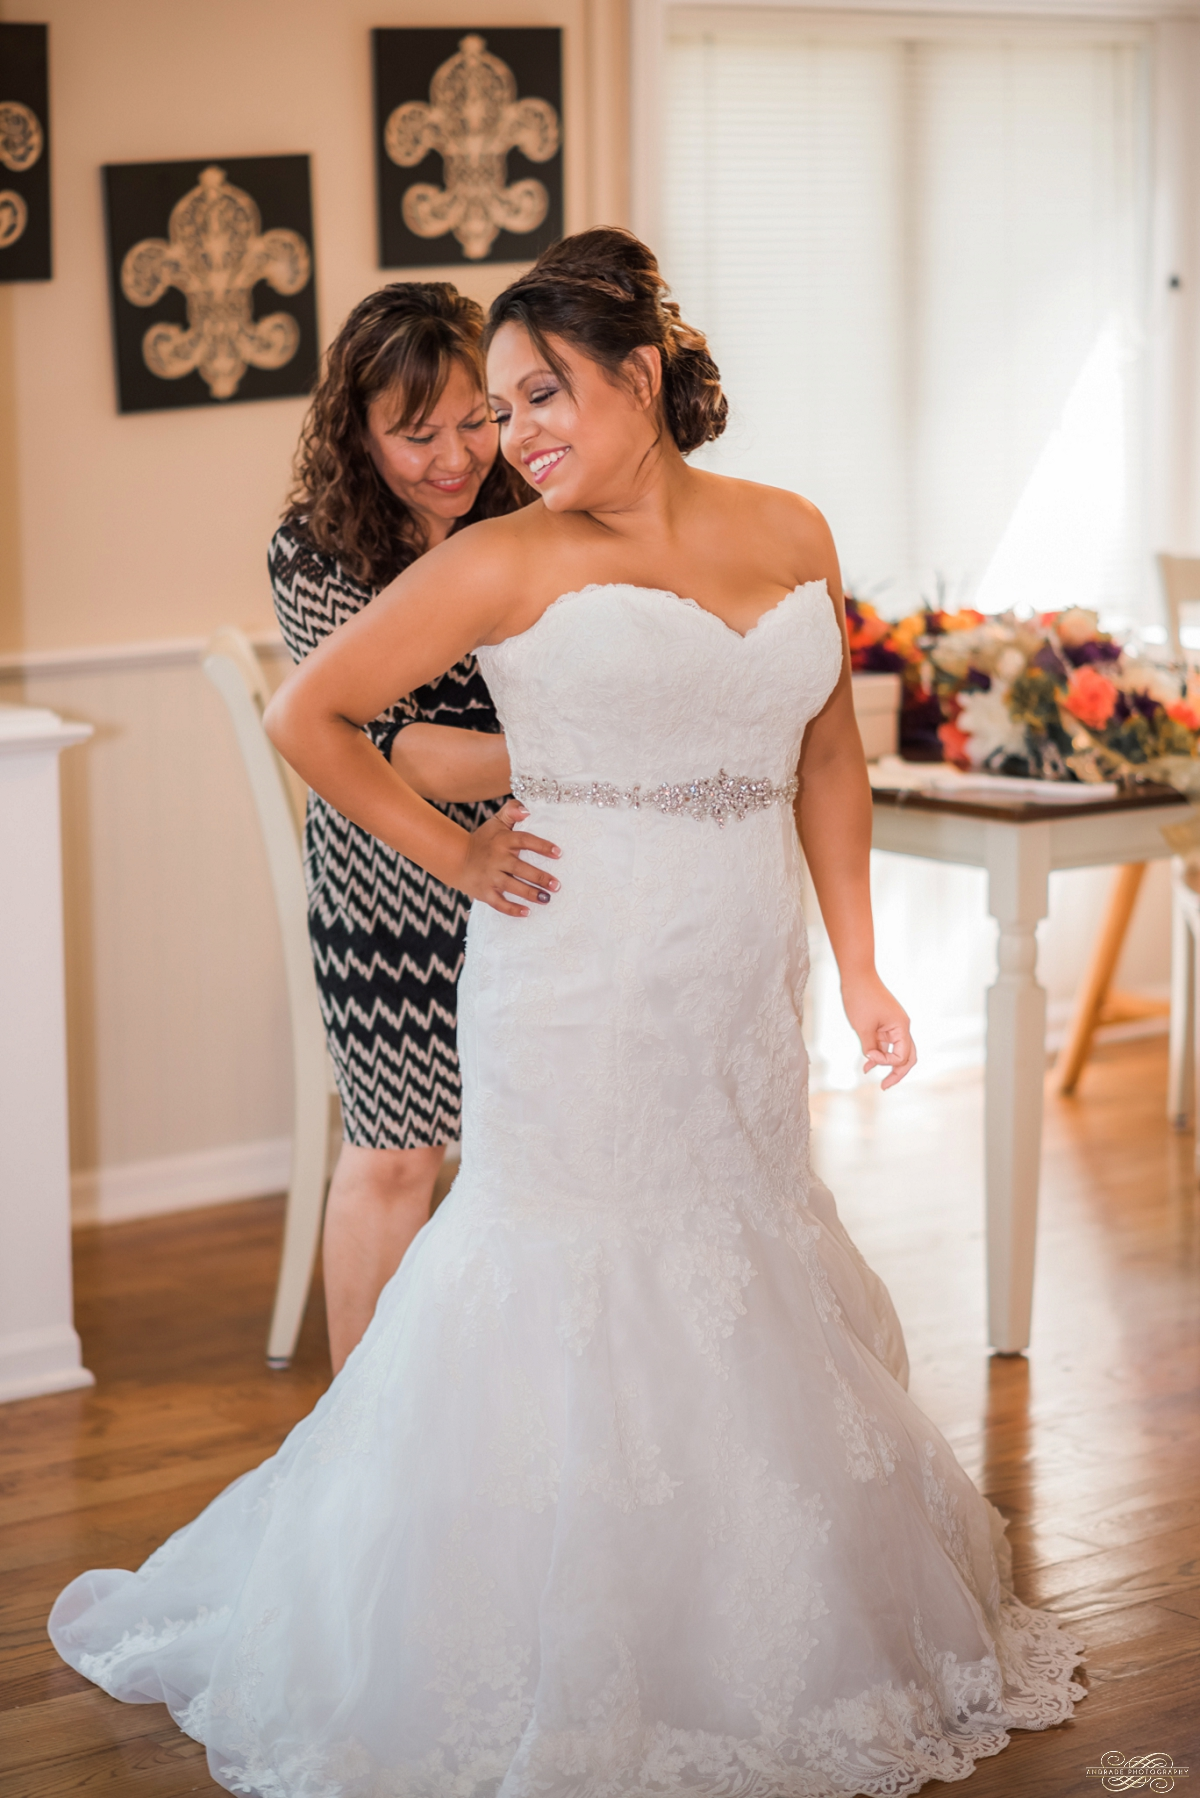 Janette + Louie Estebans Wedding Photography in Naperville - Naperville Wedding Photographer_0013.jpg